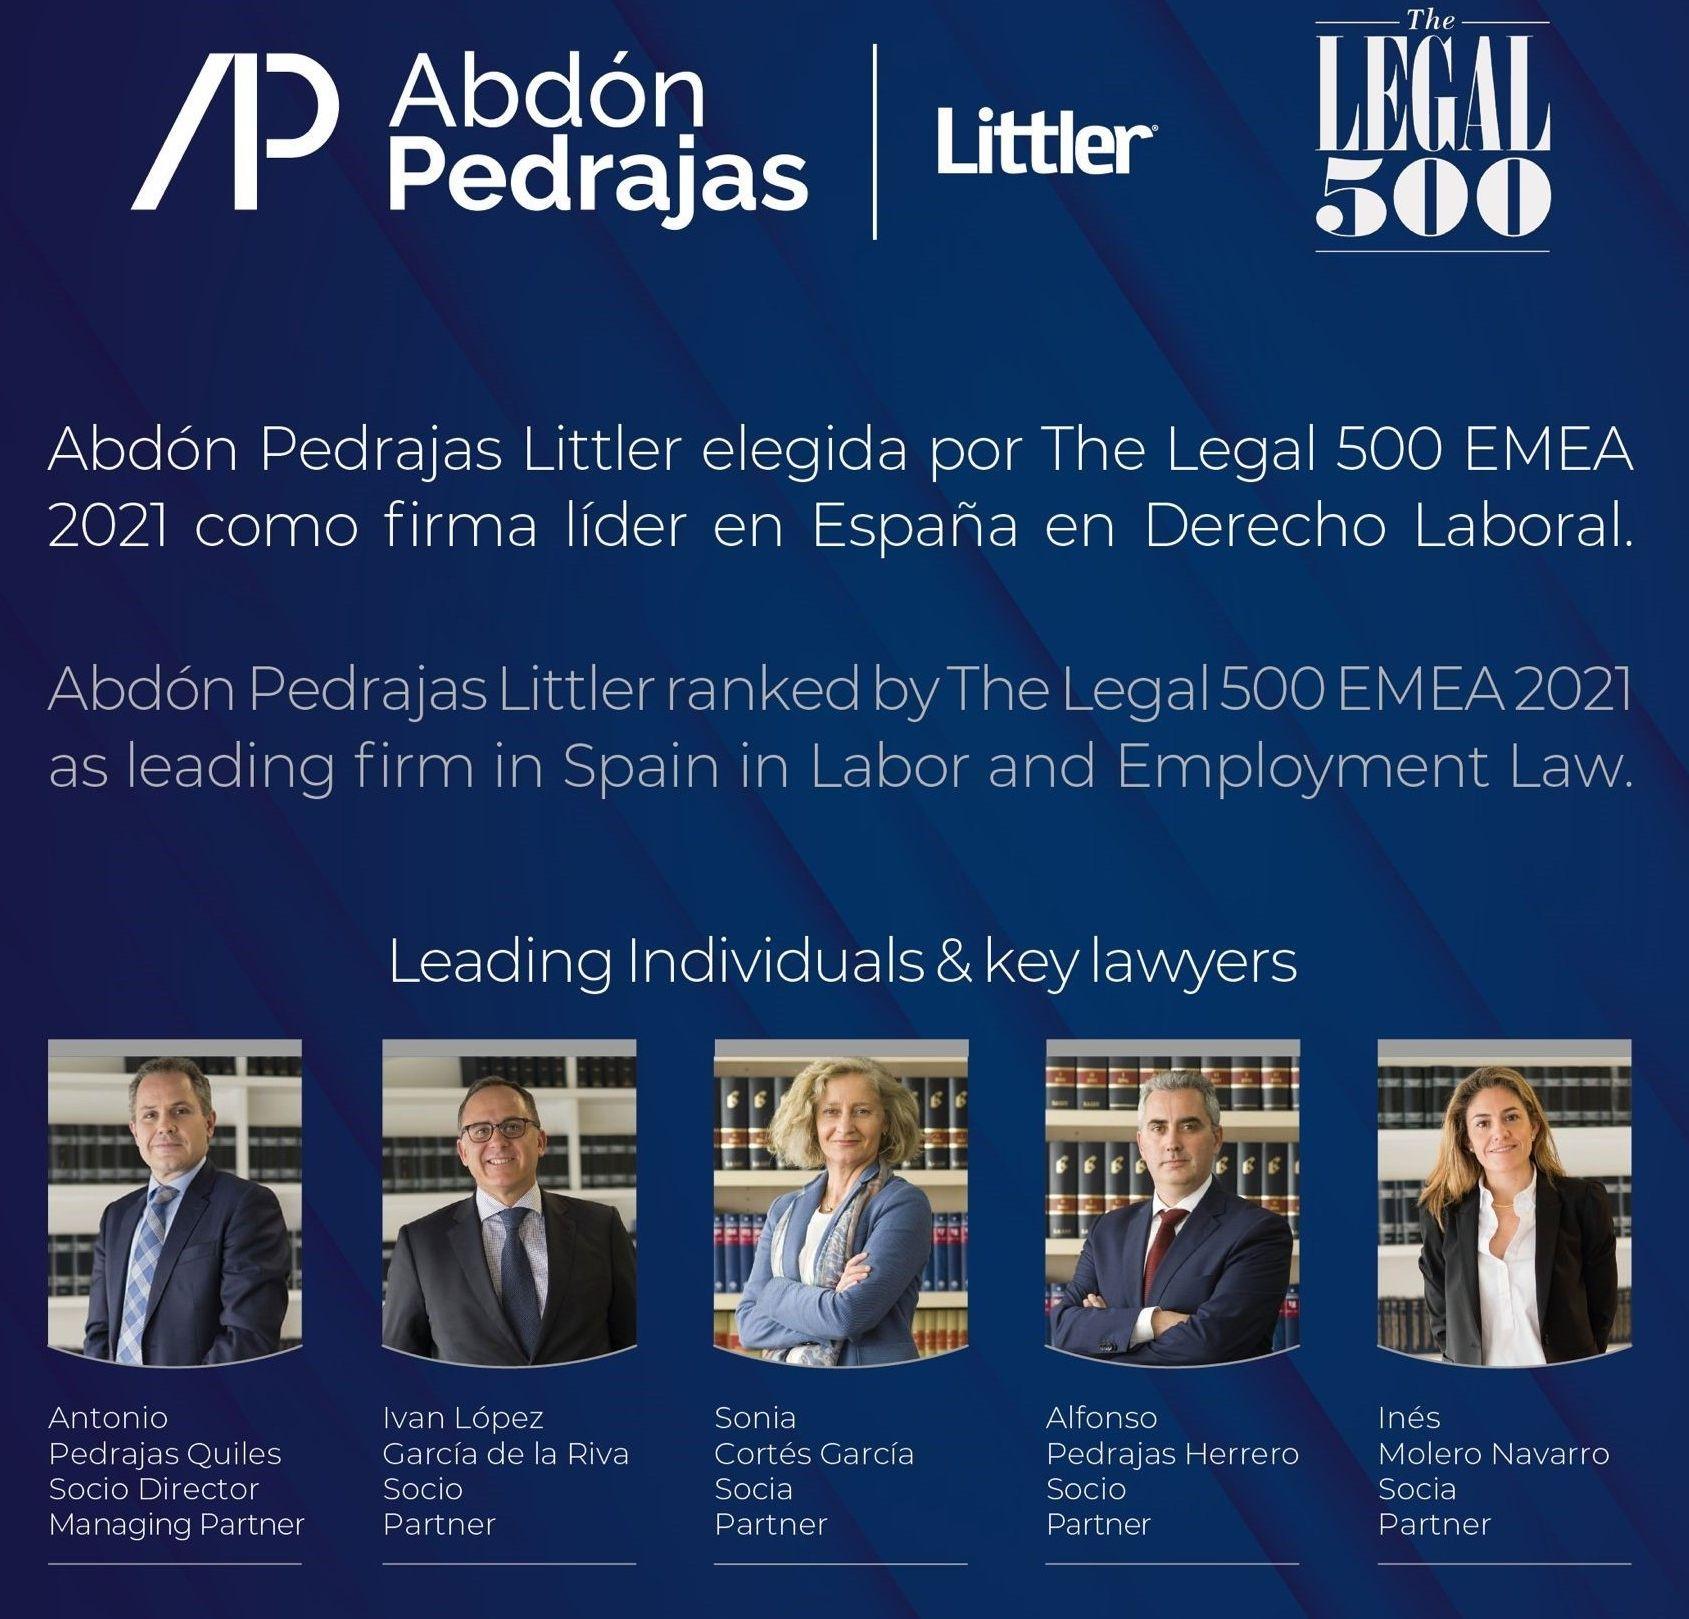 Abdón Pedrajas Littler elegida por The Legal 500 EMEA 2021 como firma líder en España en Derecho Laboral.